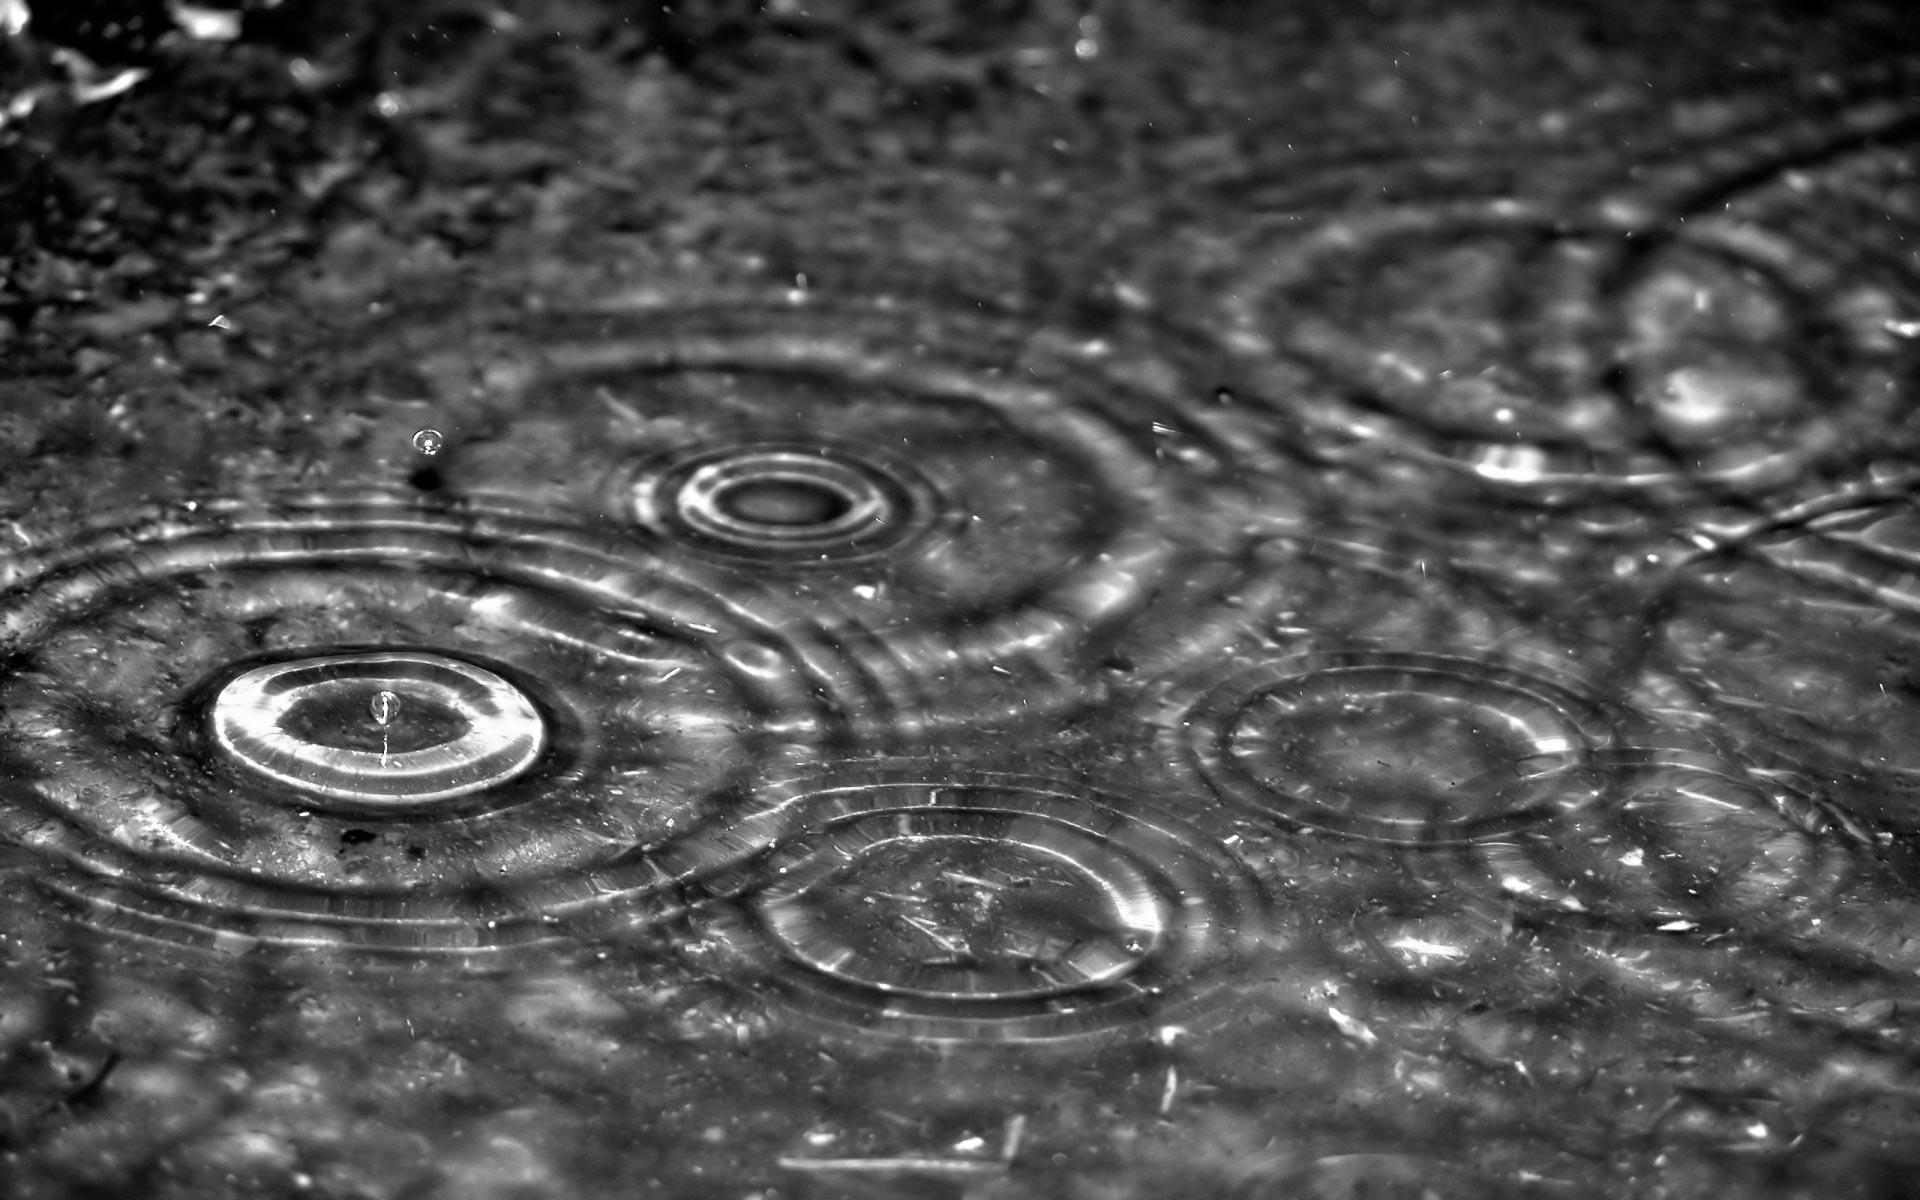 tntn photos Rain Wallpaper Hd | tntn photos